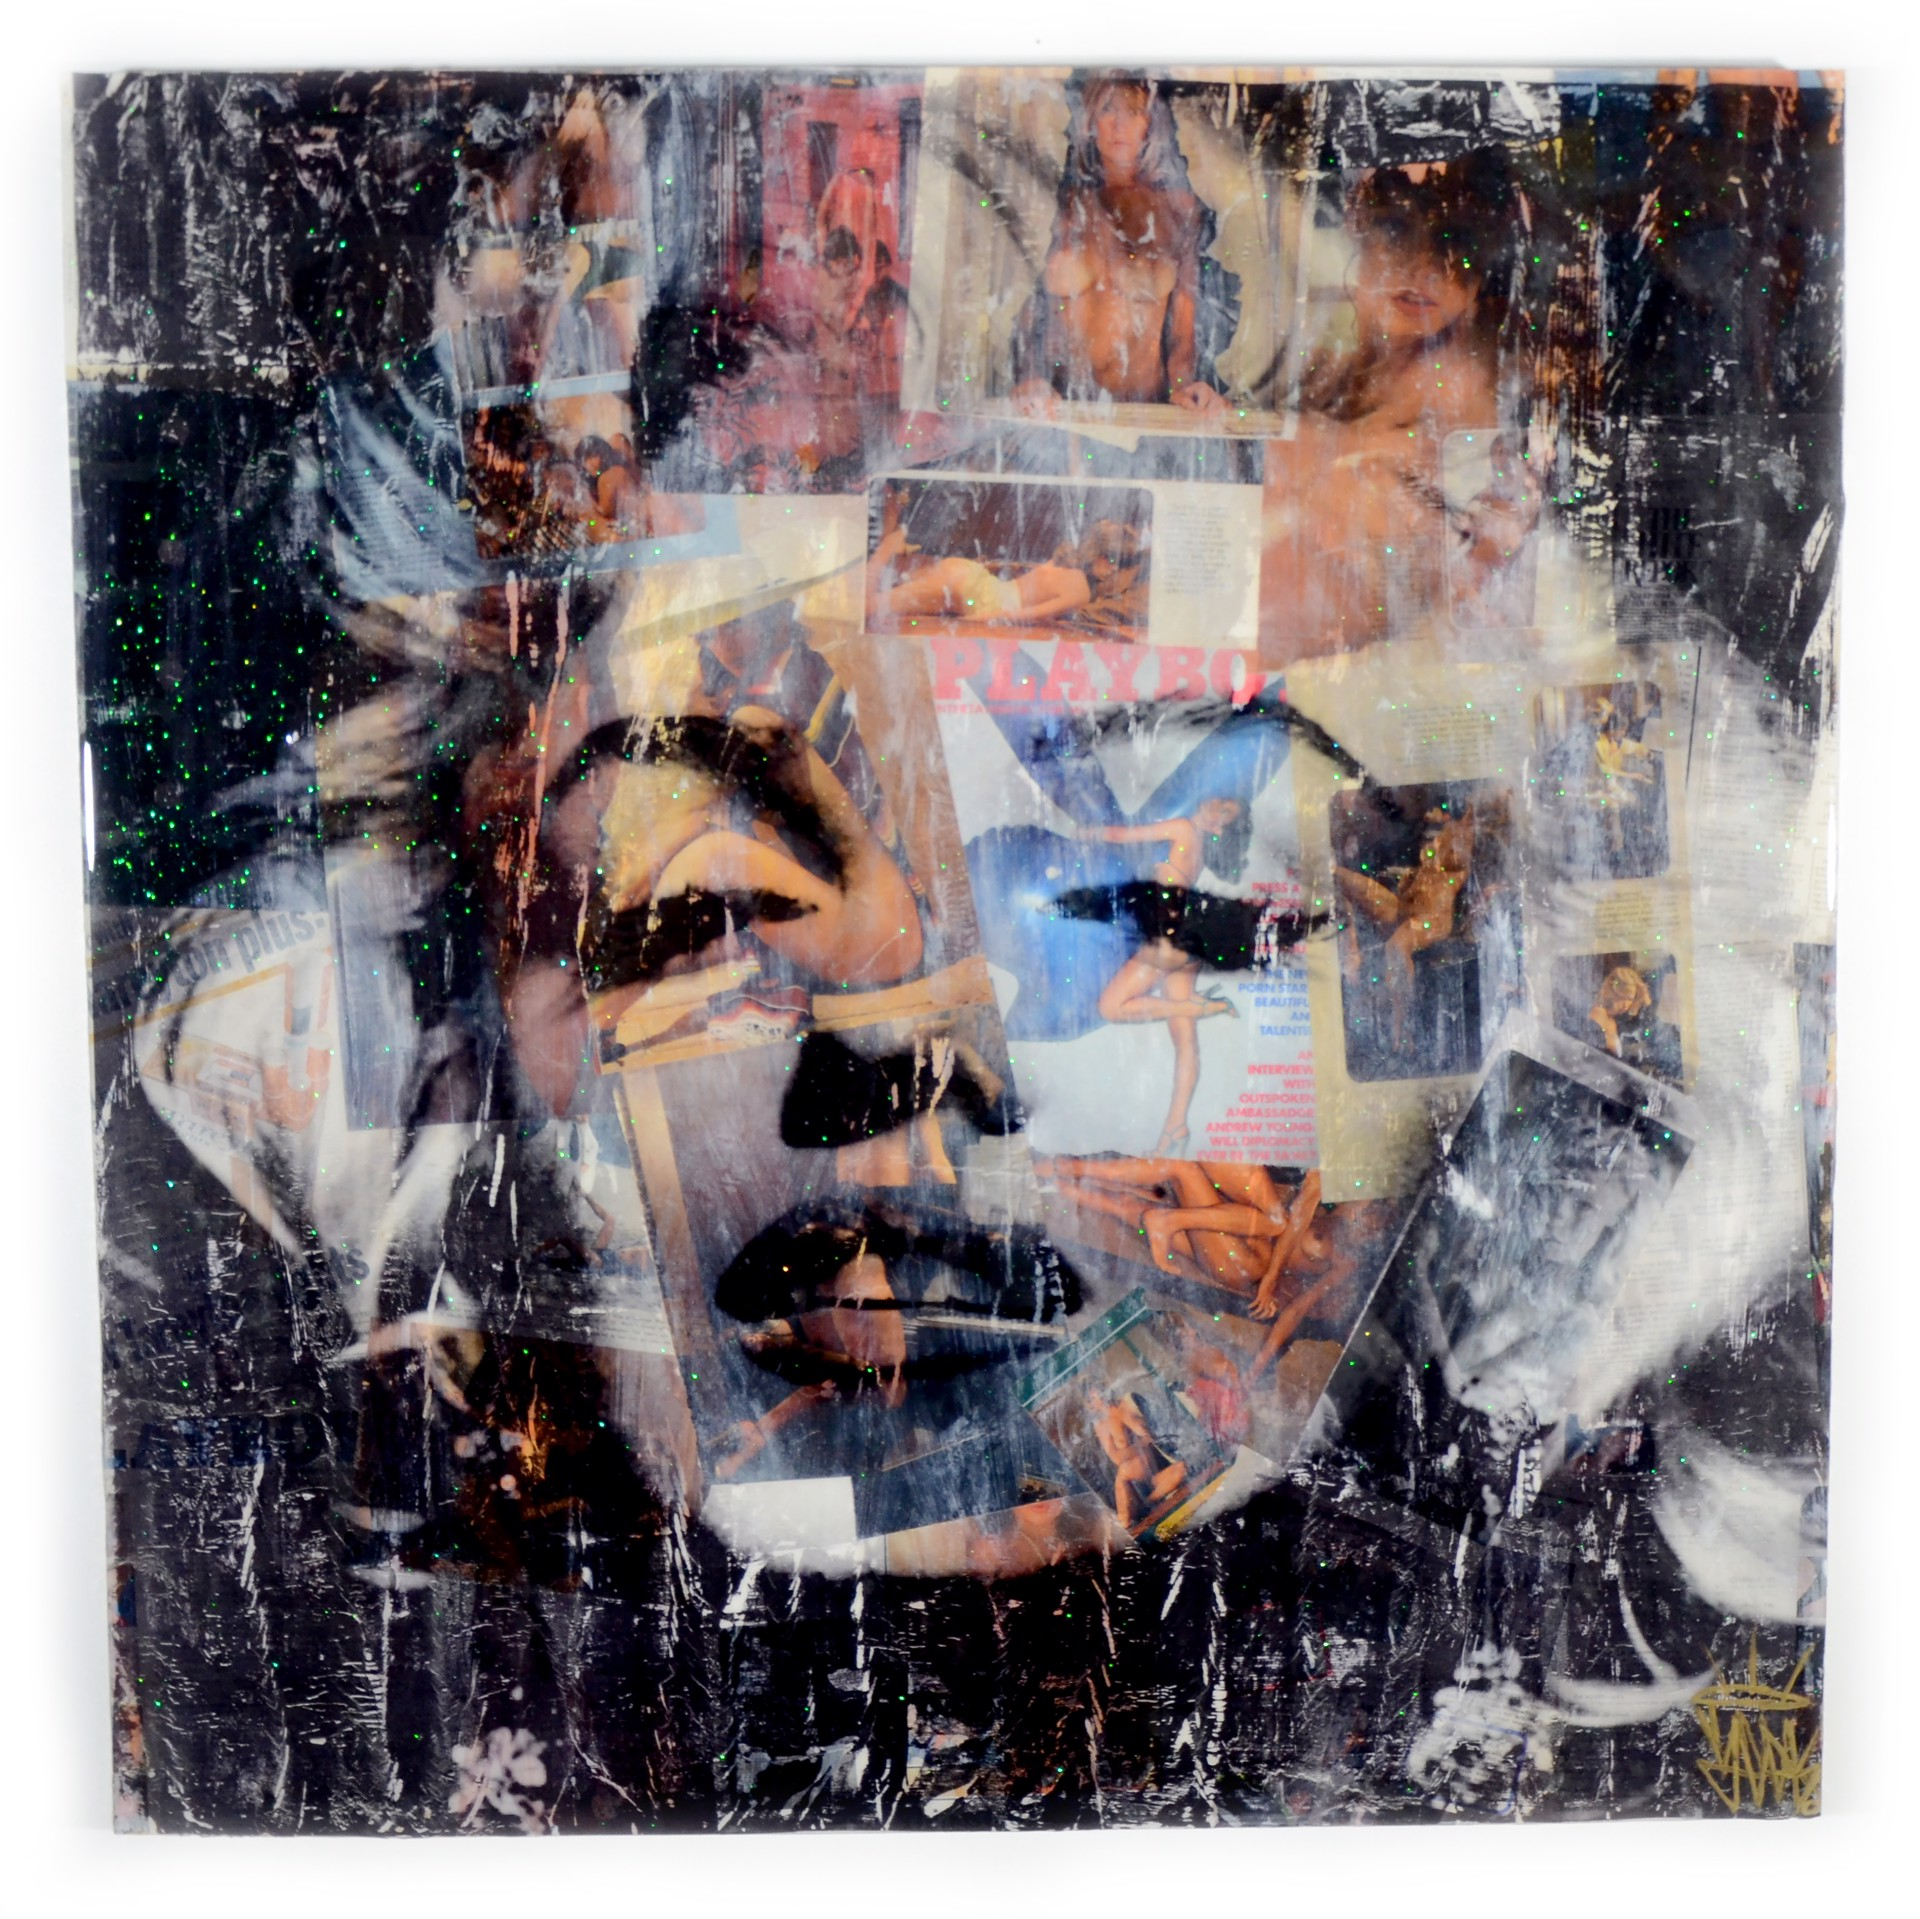 Playboy Marilyn - SOLD by Seek One